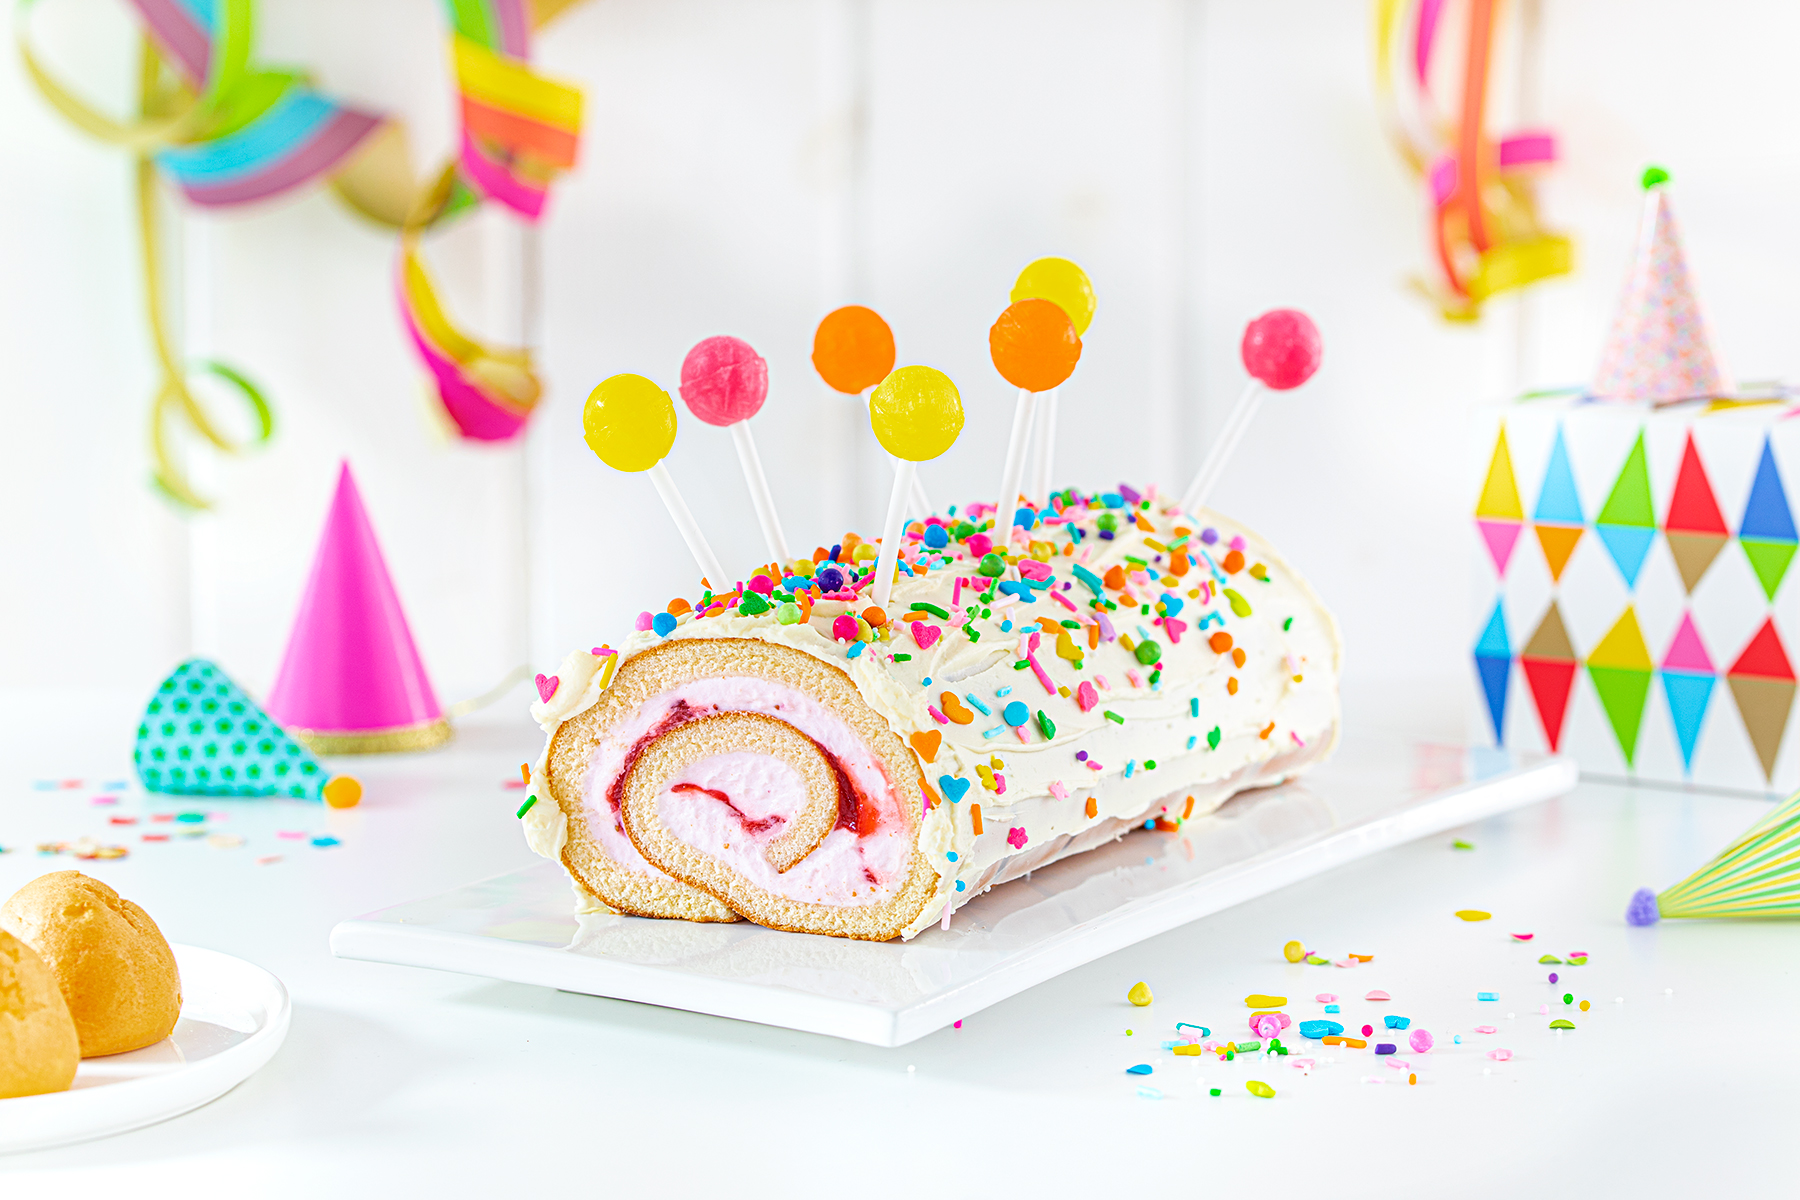 Kinderrezept für eure Karnevalsparty: Lolli-Rolle! 1